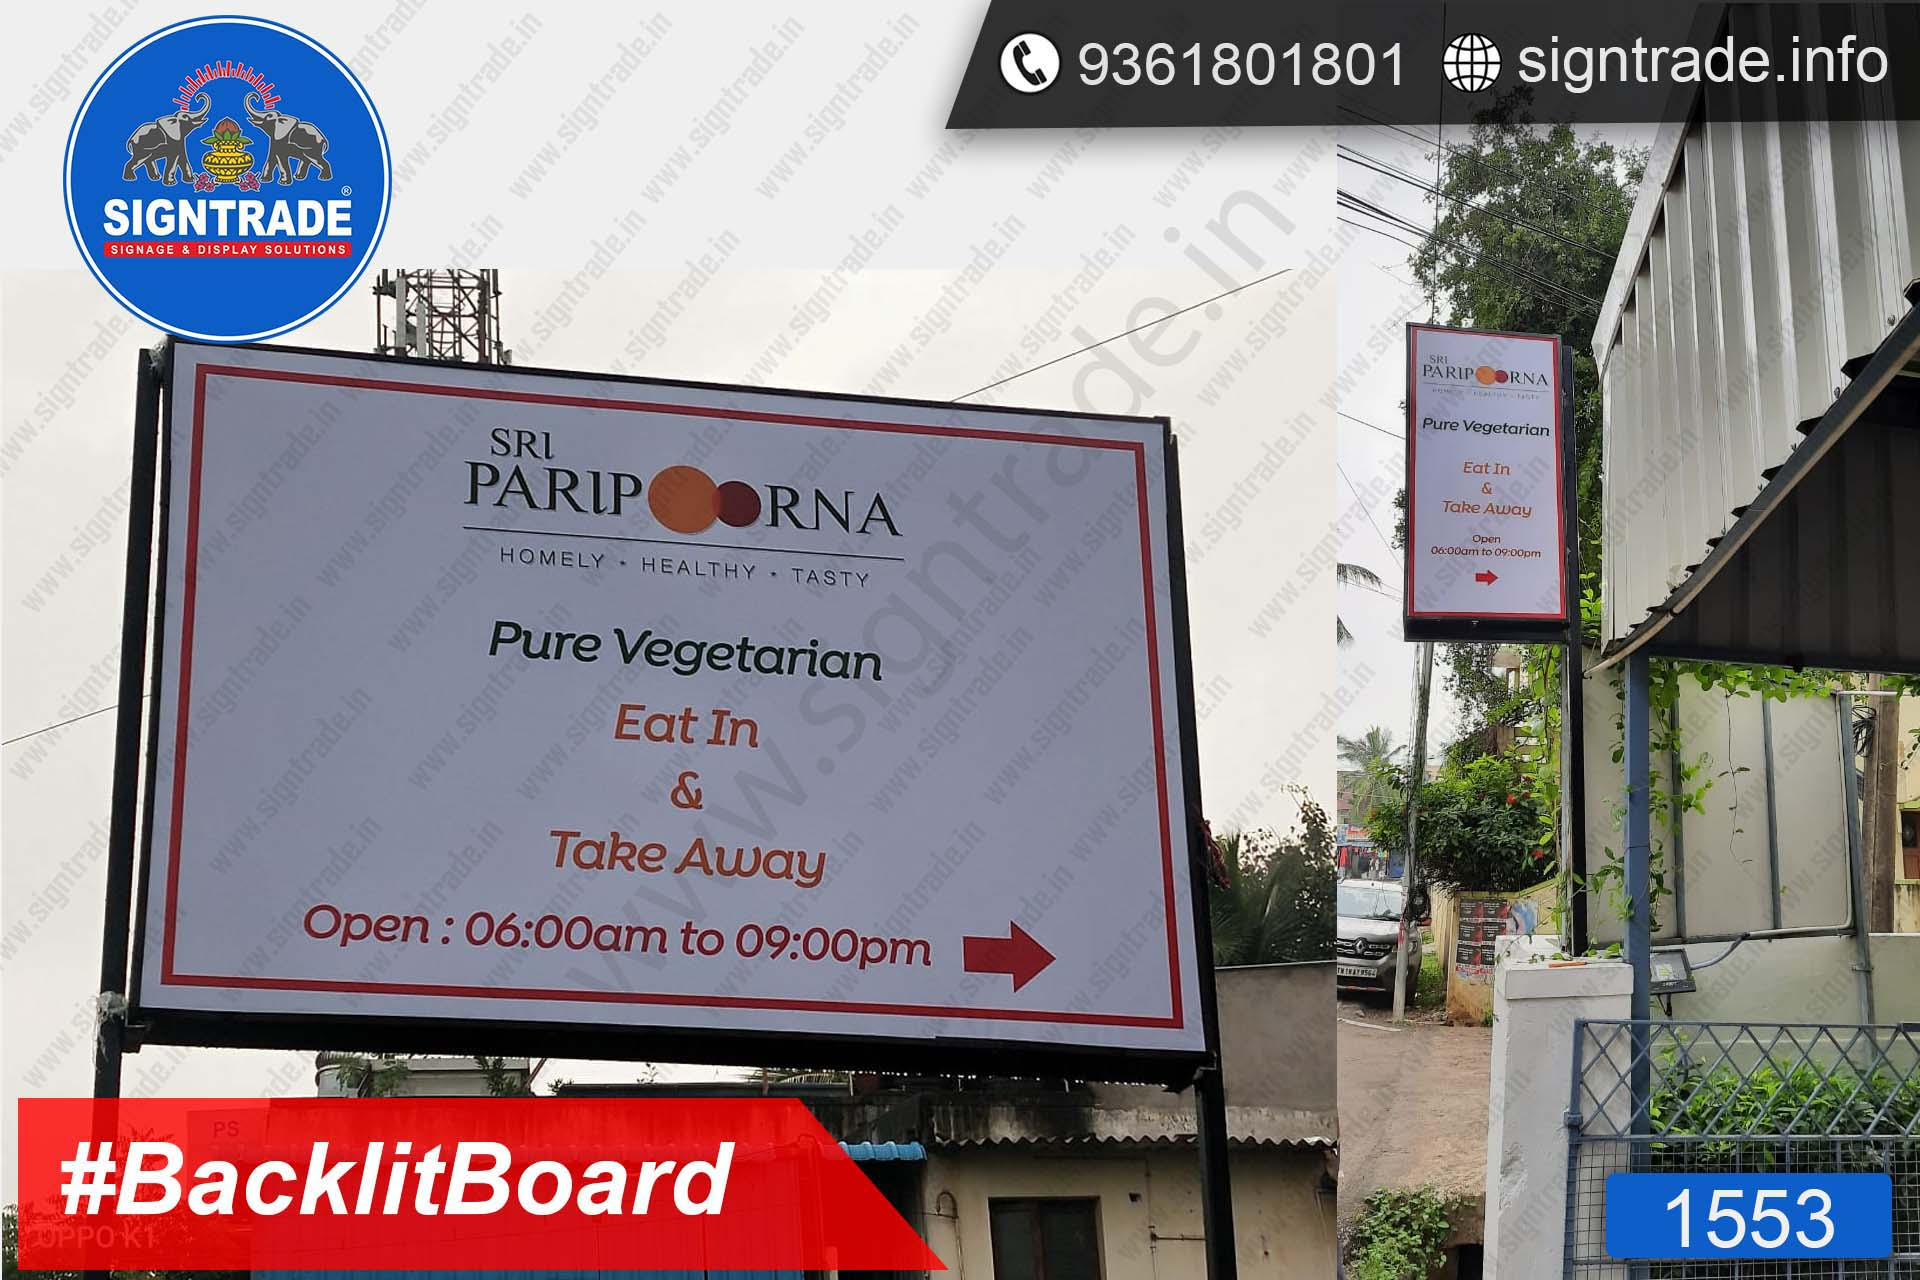 Sri Paripoorna Vegetarian Restaurant - Chennai - SIGNTRADE - Digital Printing Service, Backlit Flex Board Manufacturers in Chennai